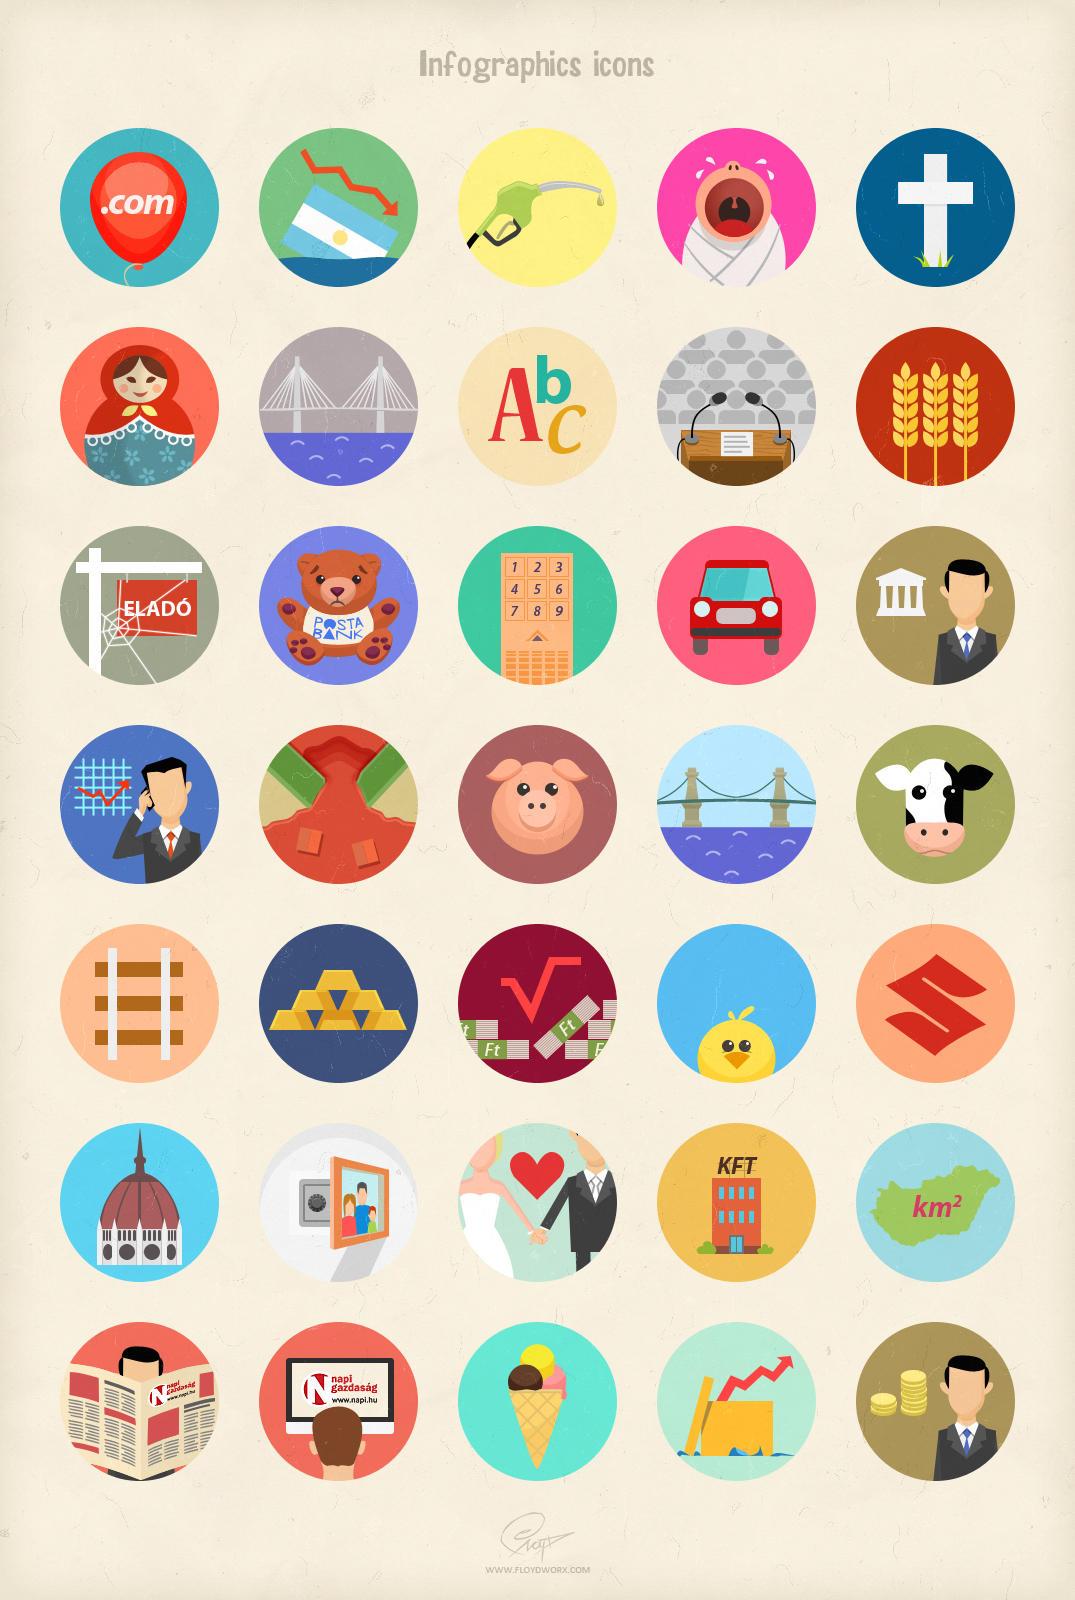 Infographics icons by floydworx